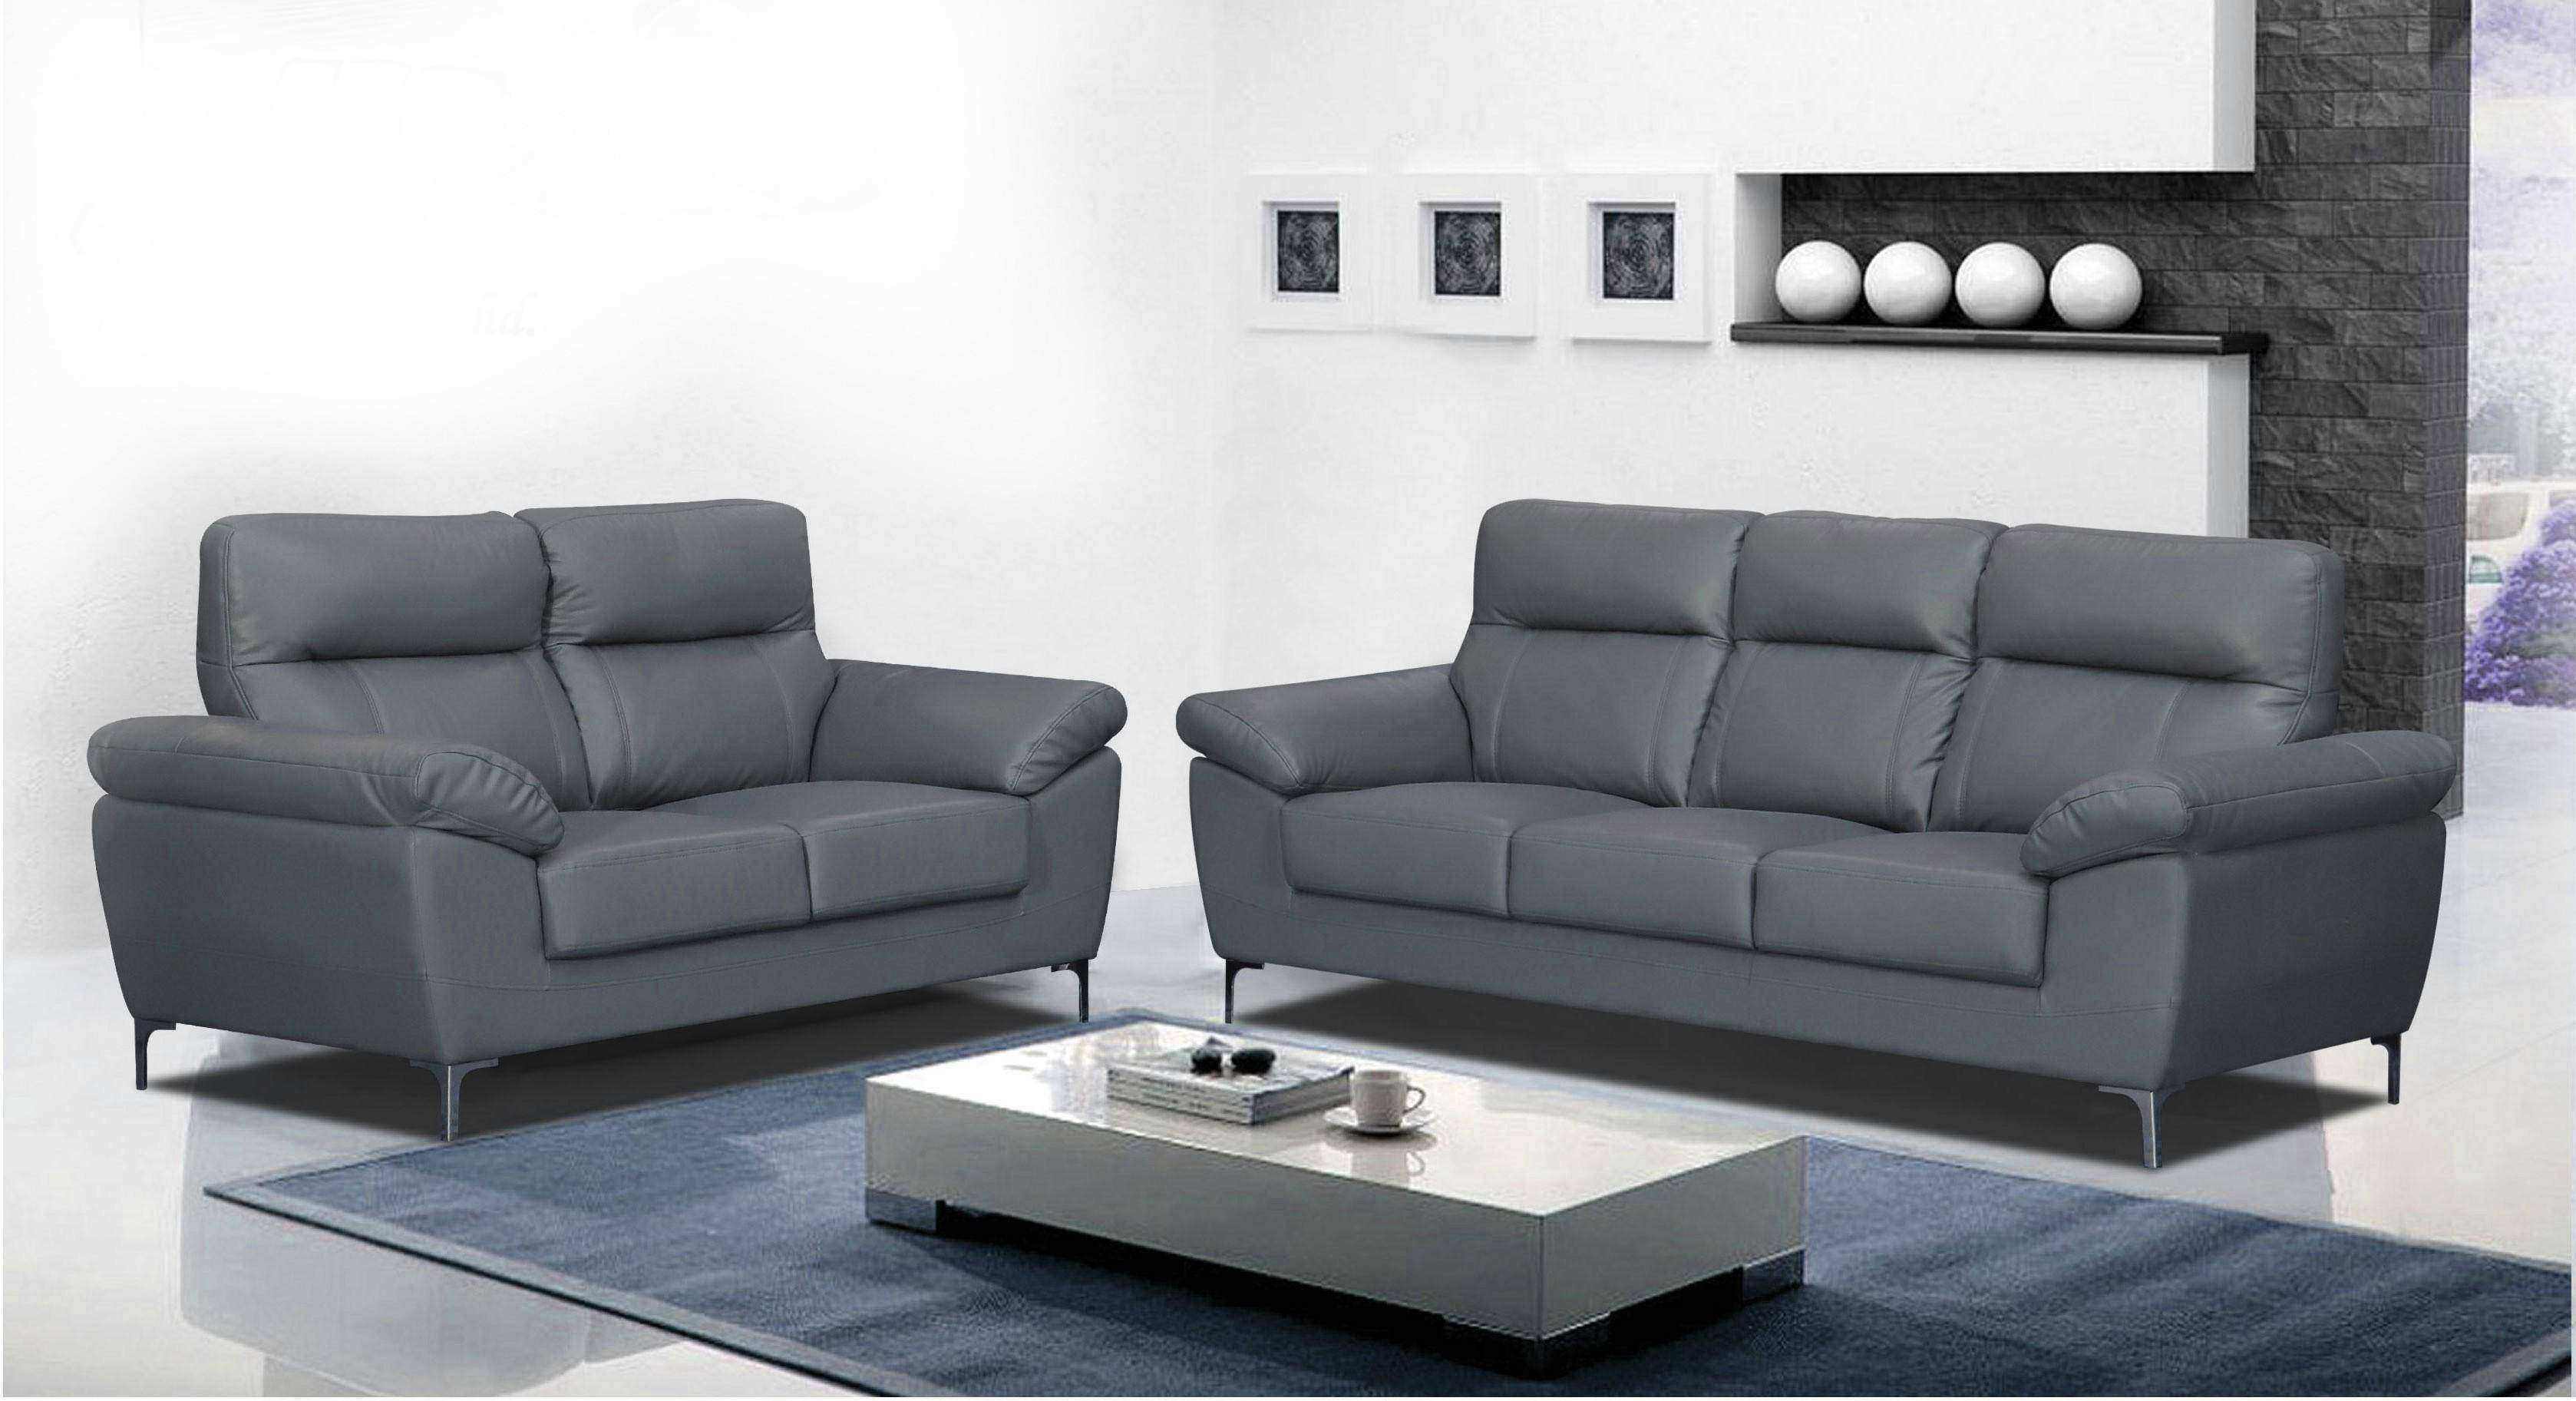 Sofa Components Furniture